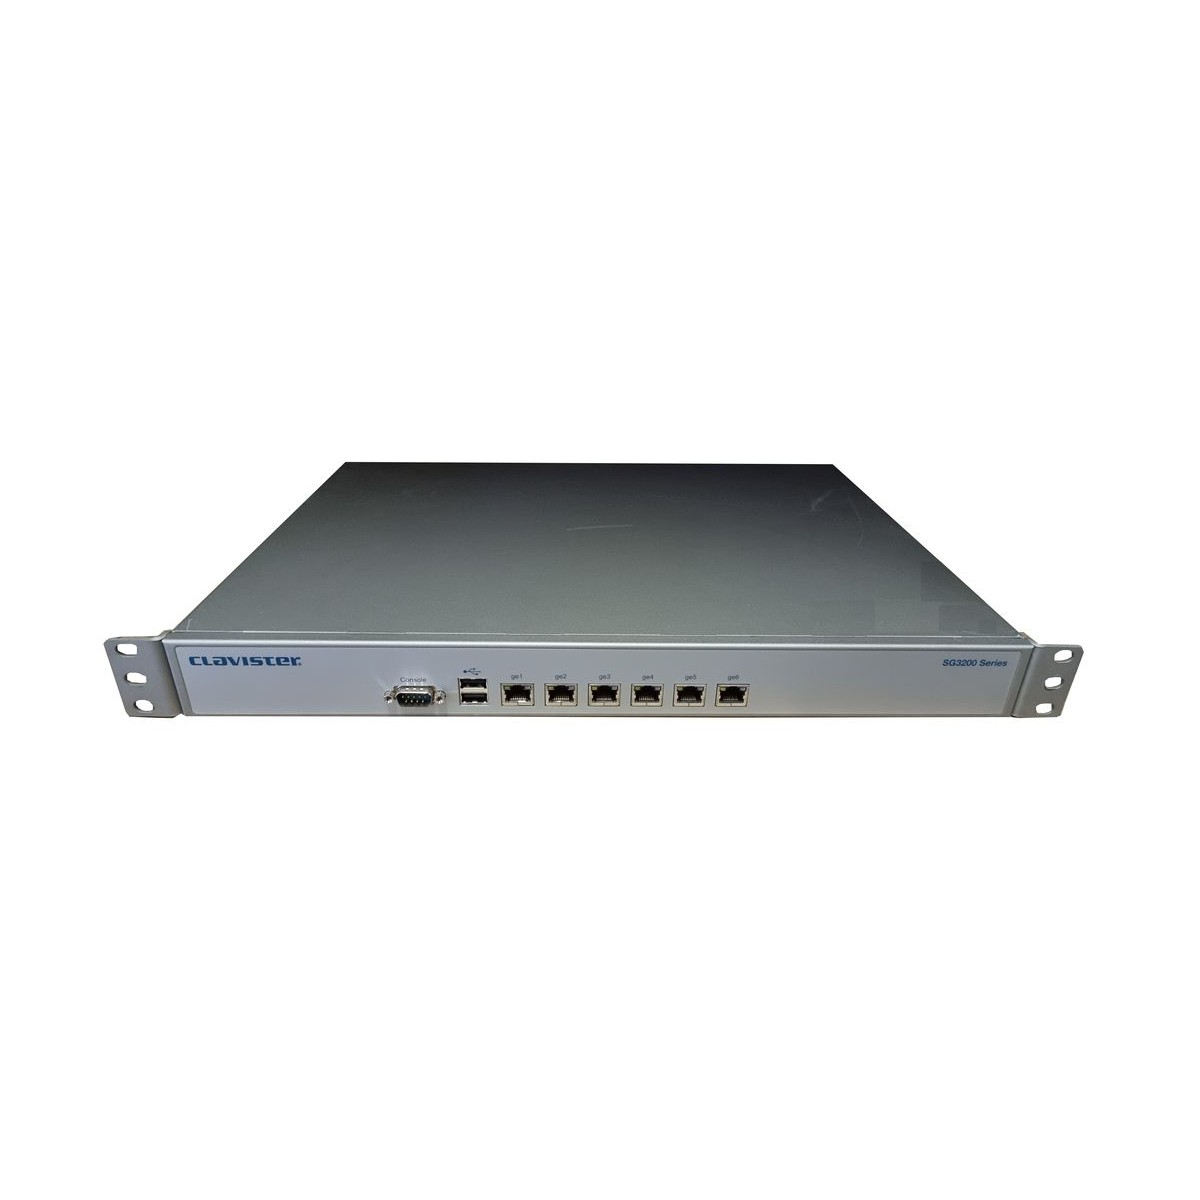 PAMIEC IBM SAMSUNG 2GB PC3-10600E 2Rx8 43X5291